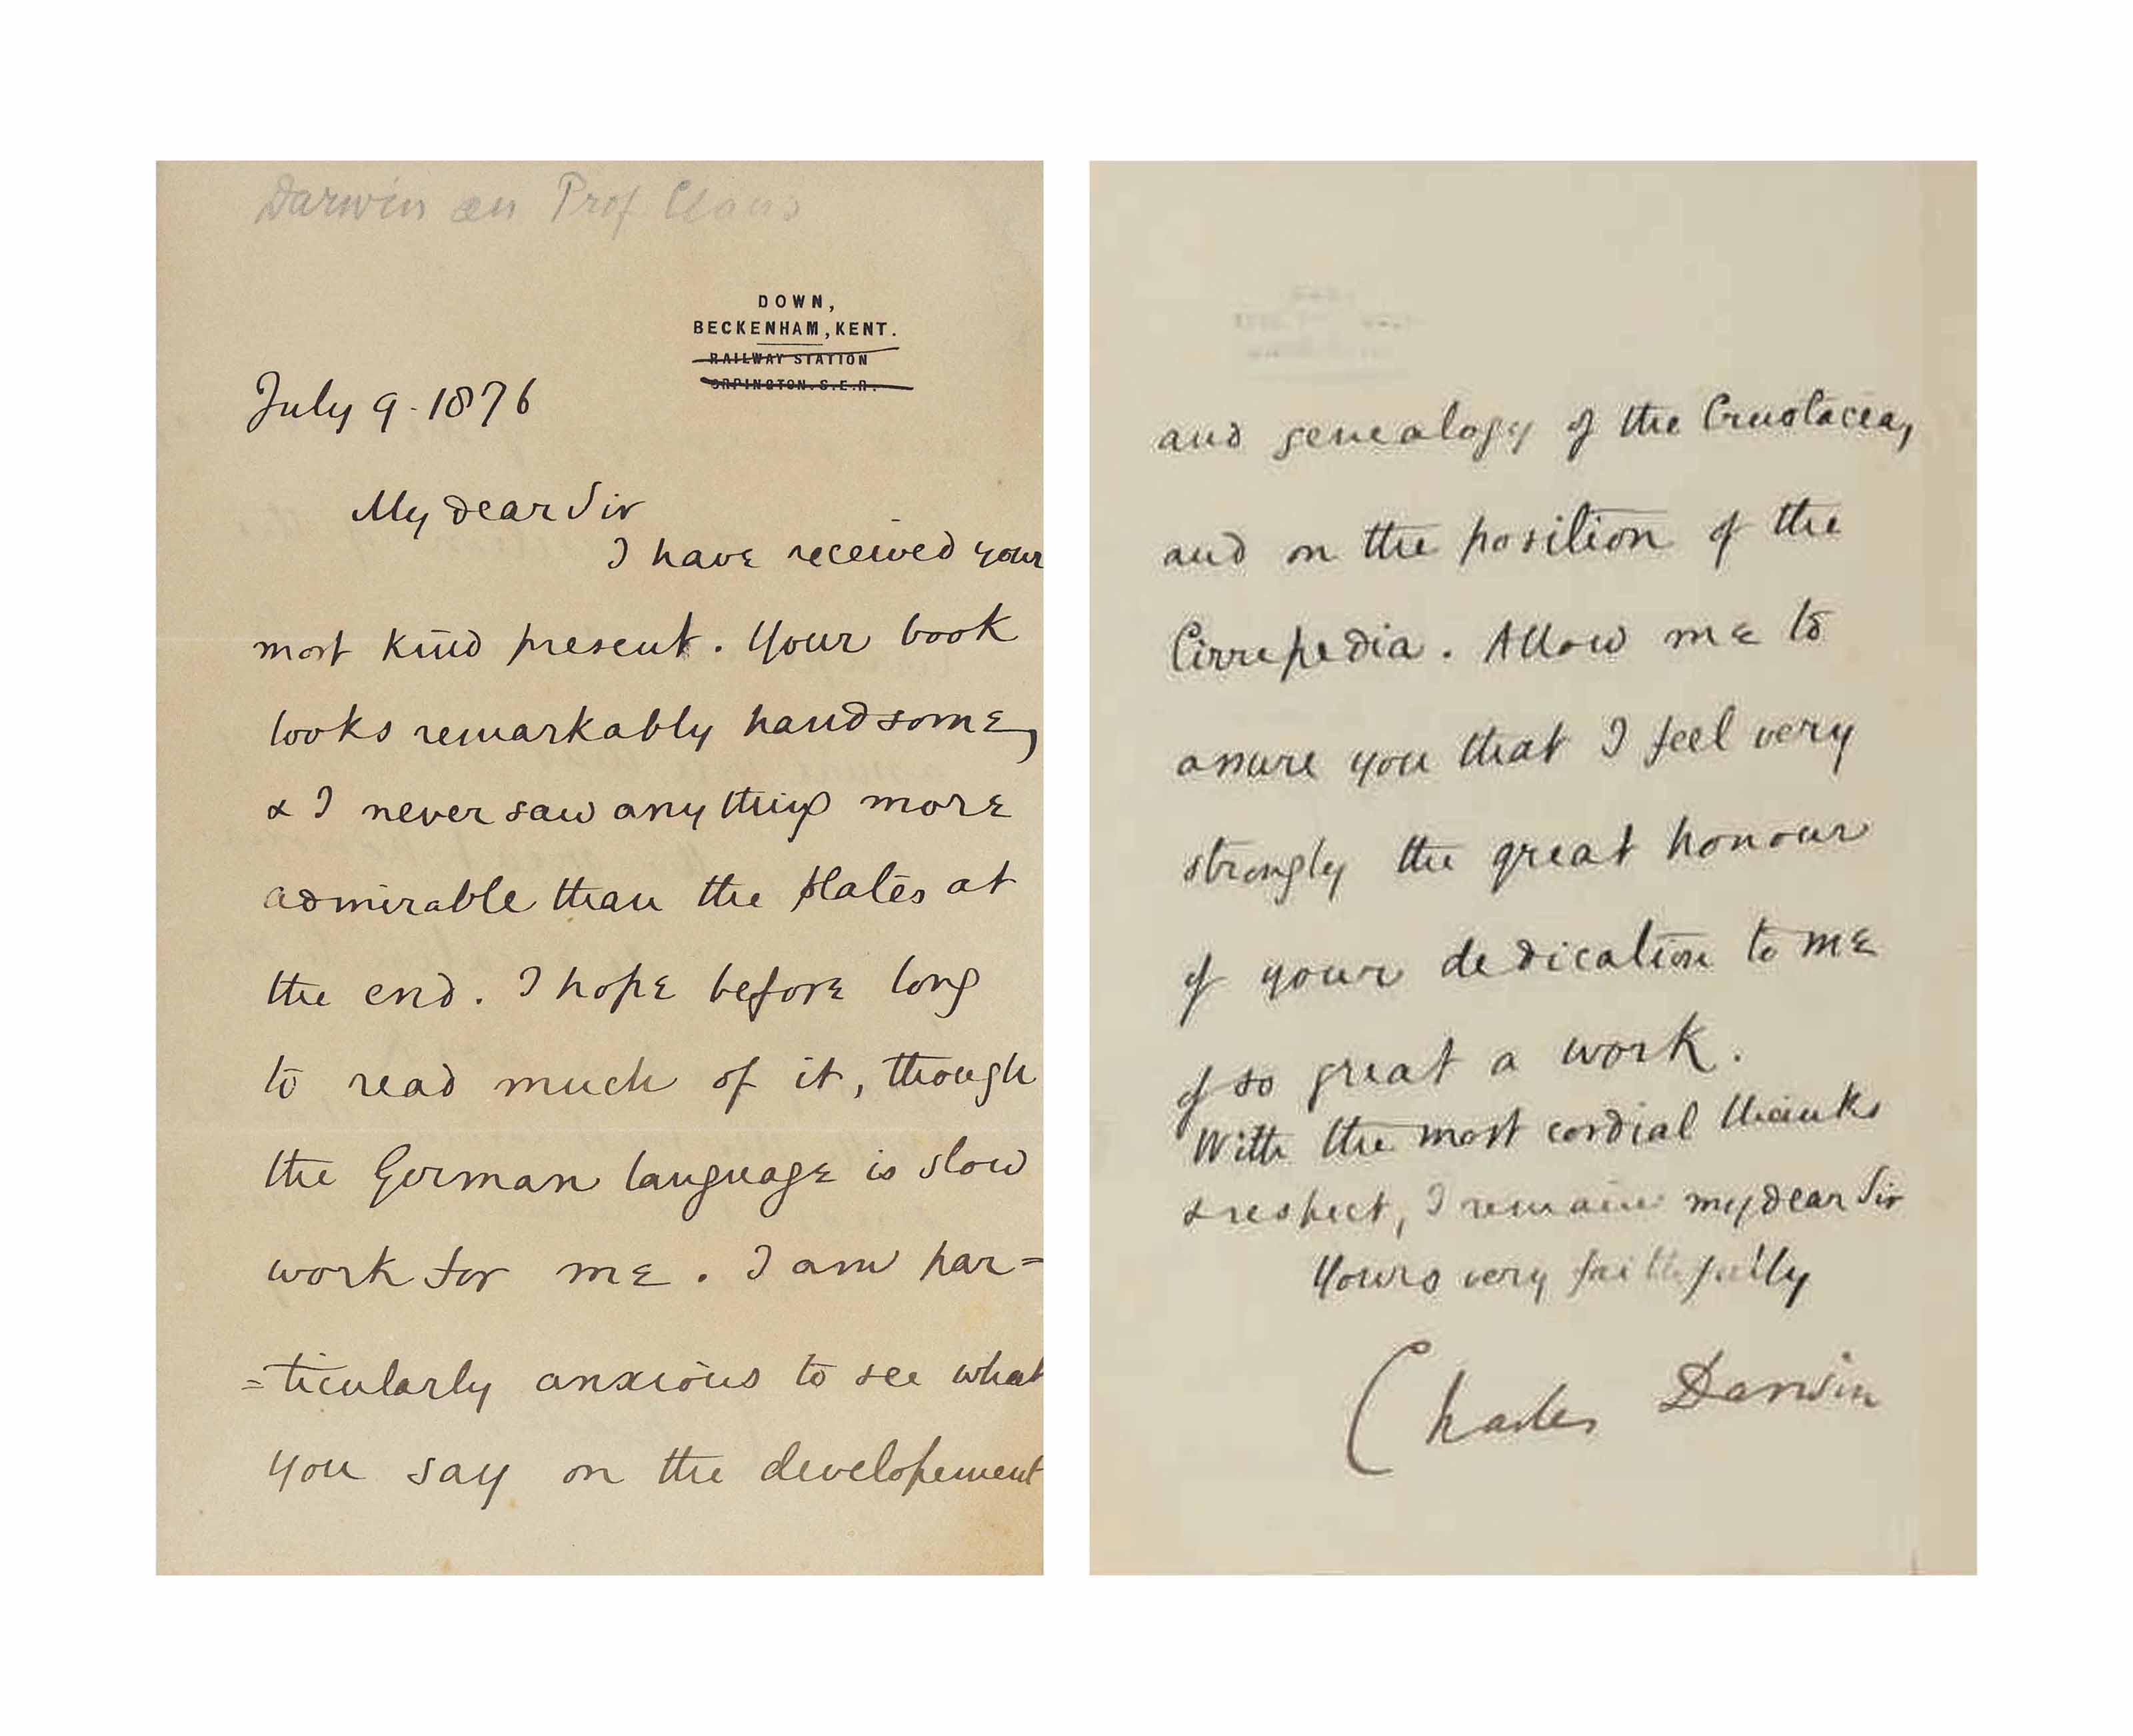 DARWIN, Charles (1809-1882). Letter signed ('Charles Darwin') to [Carl Friedrich Wilhelm Claus: 'Dear Sir'], Down [House], Beckenham, Kent, 9 July 1876.